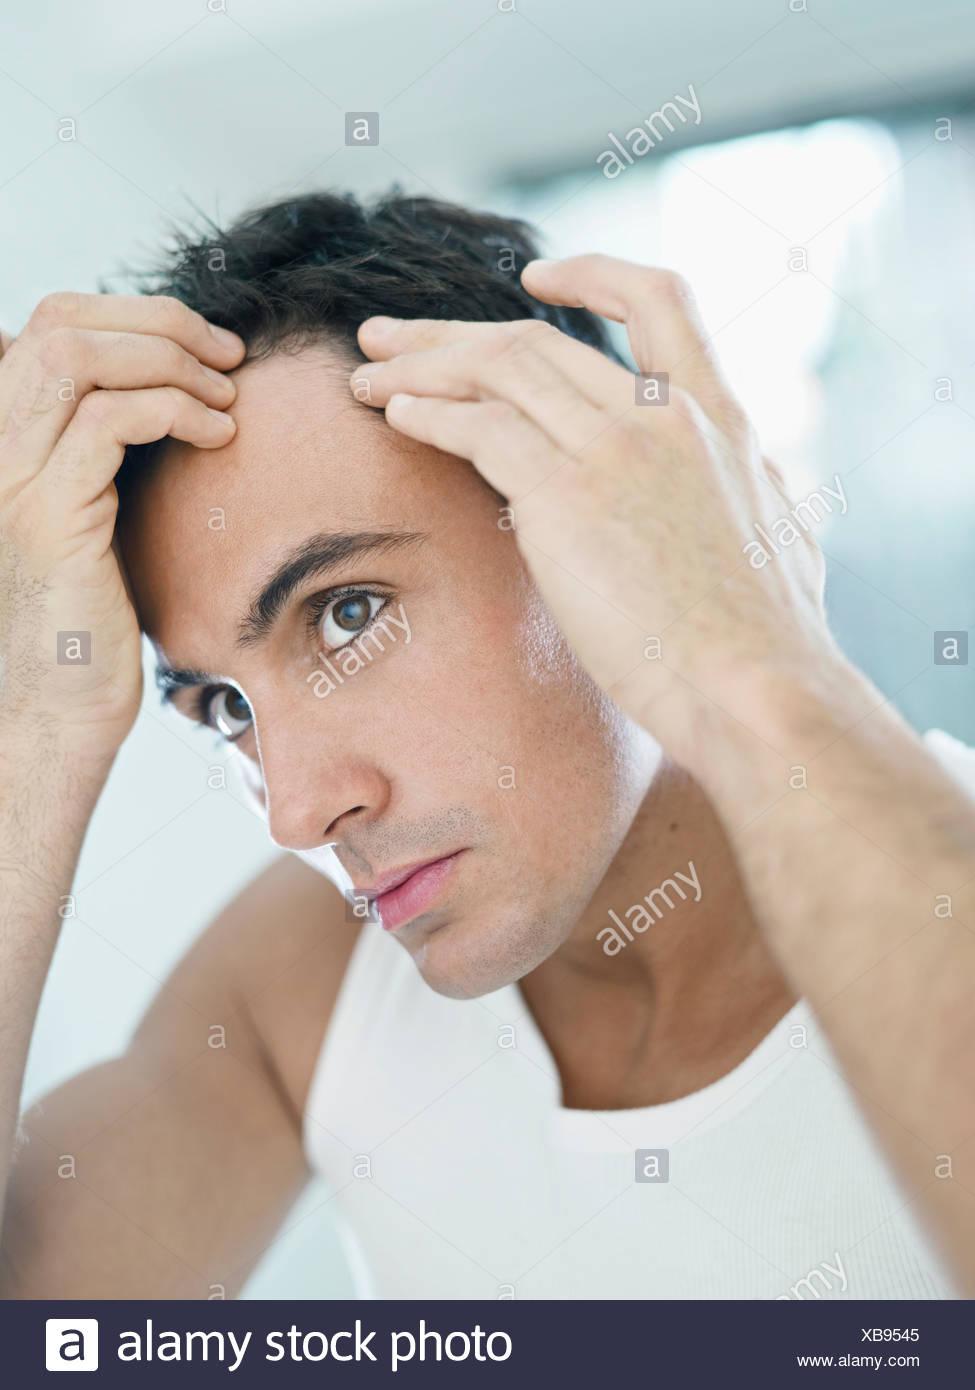 hairline hair beauty - Stock Image